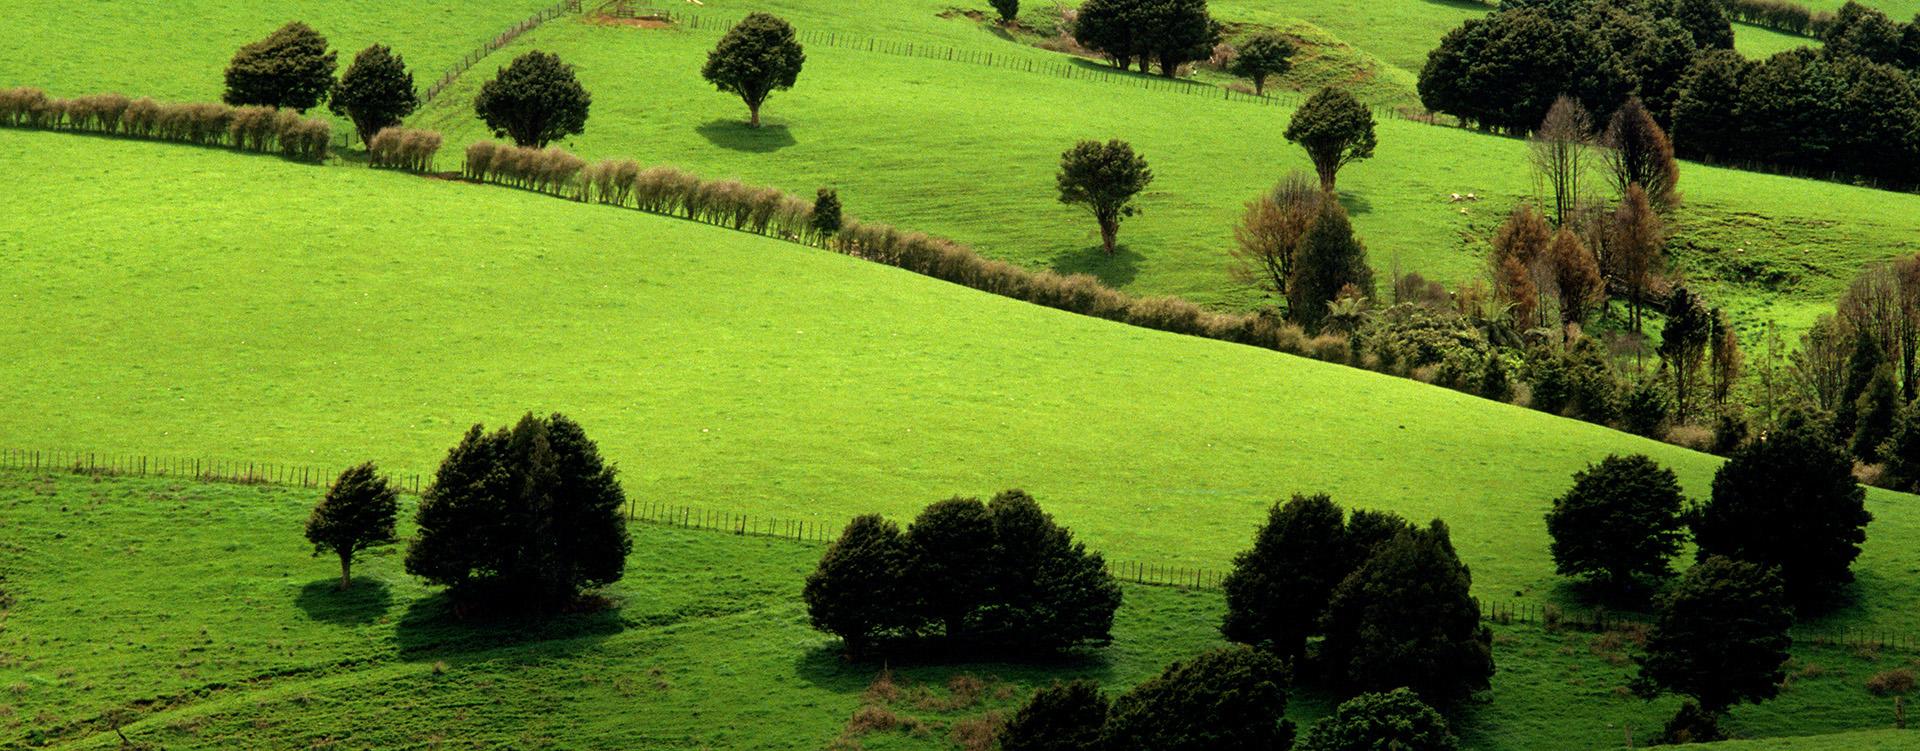 BioTrek Adventure Travel Tours - New Zealand green fields